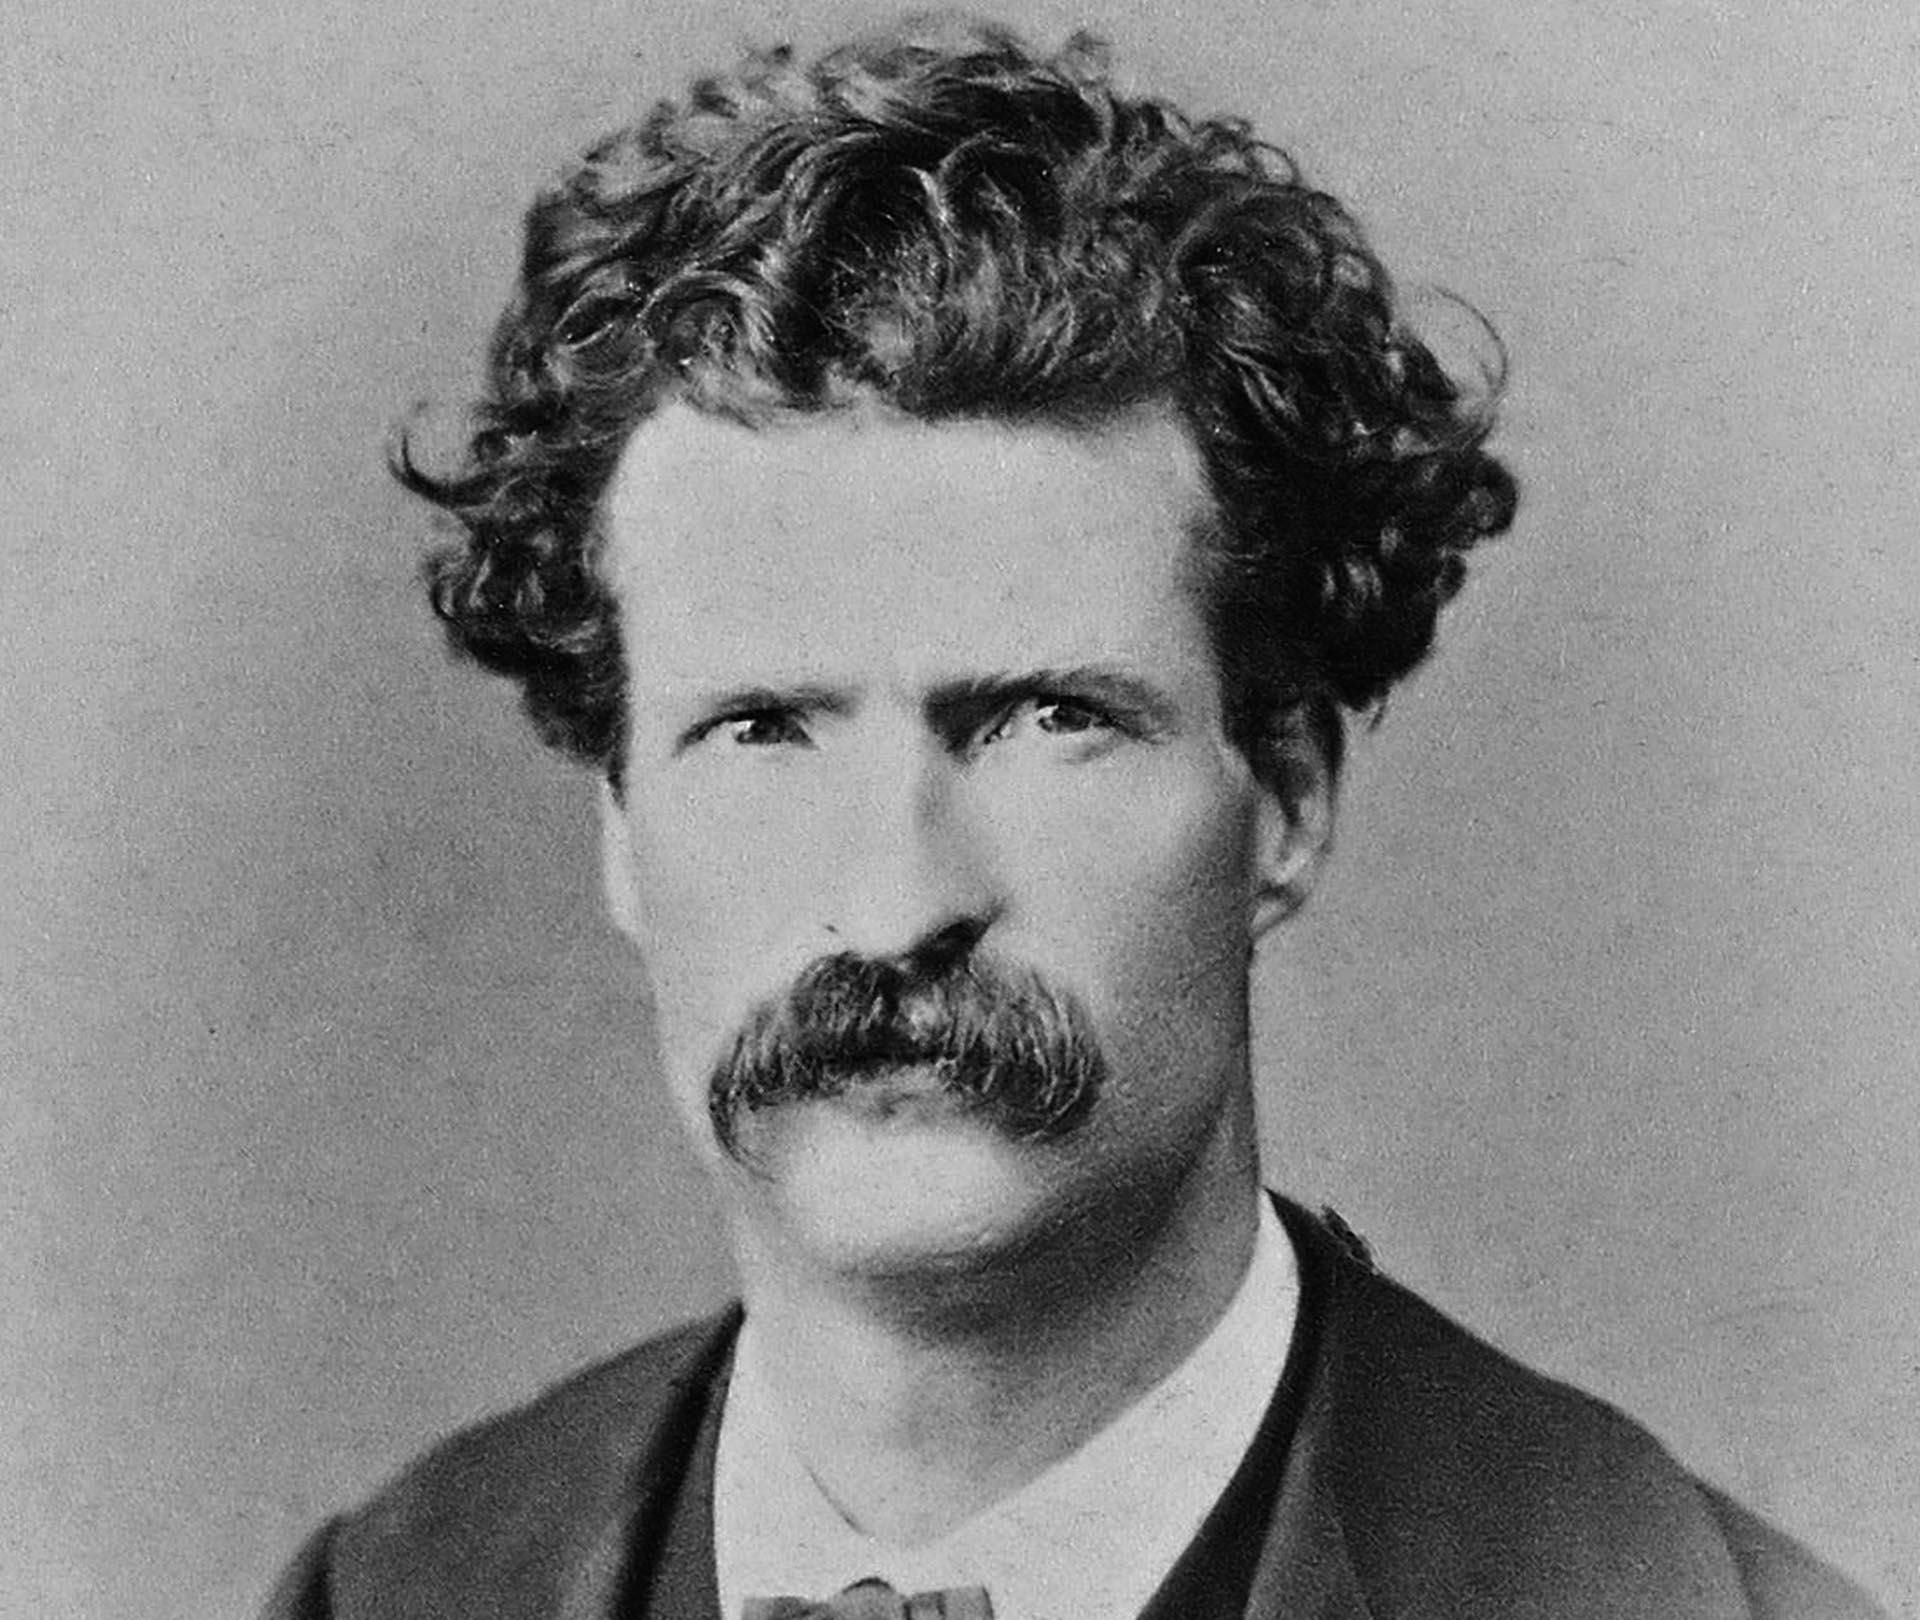 Samuel Langhorne Clemens en septiembre de 1867